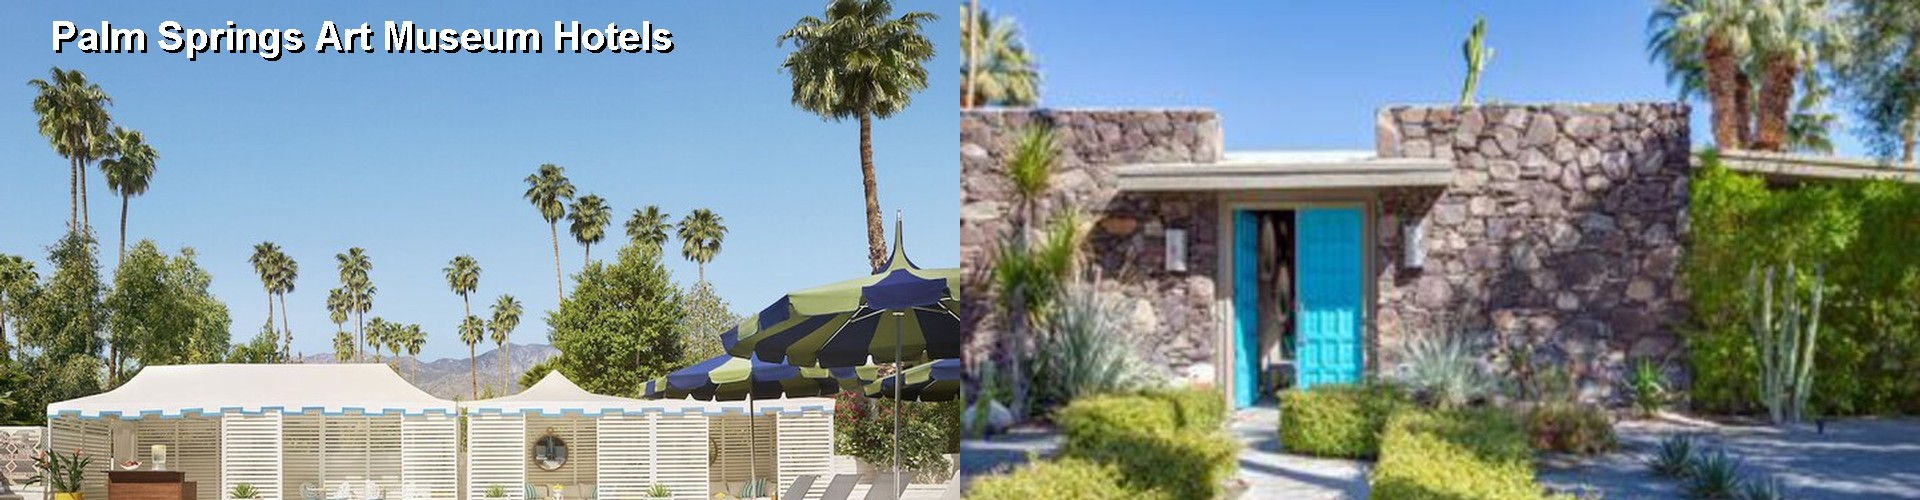 5 Best Hotels Near Palm Springs Art Museum